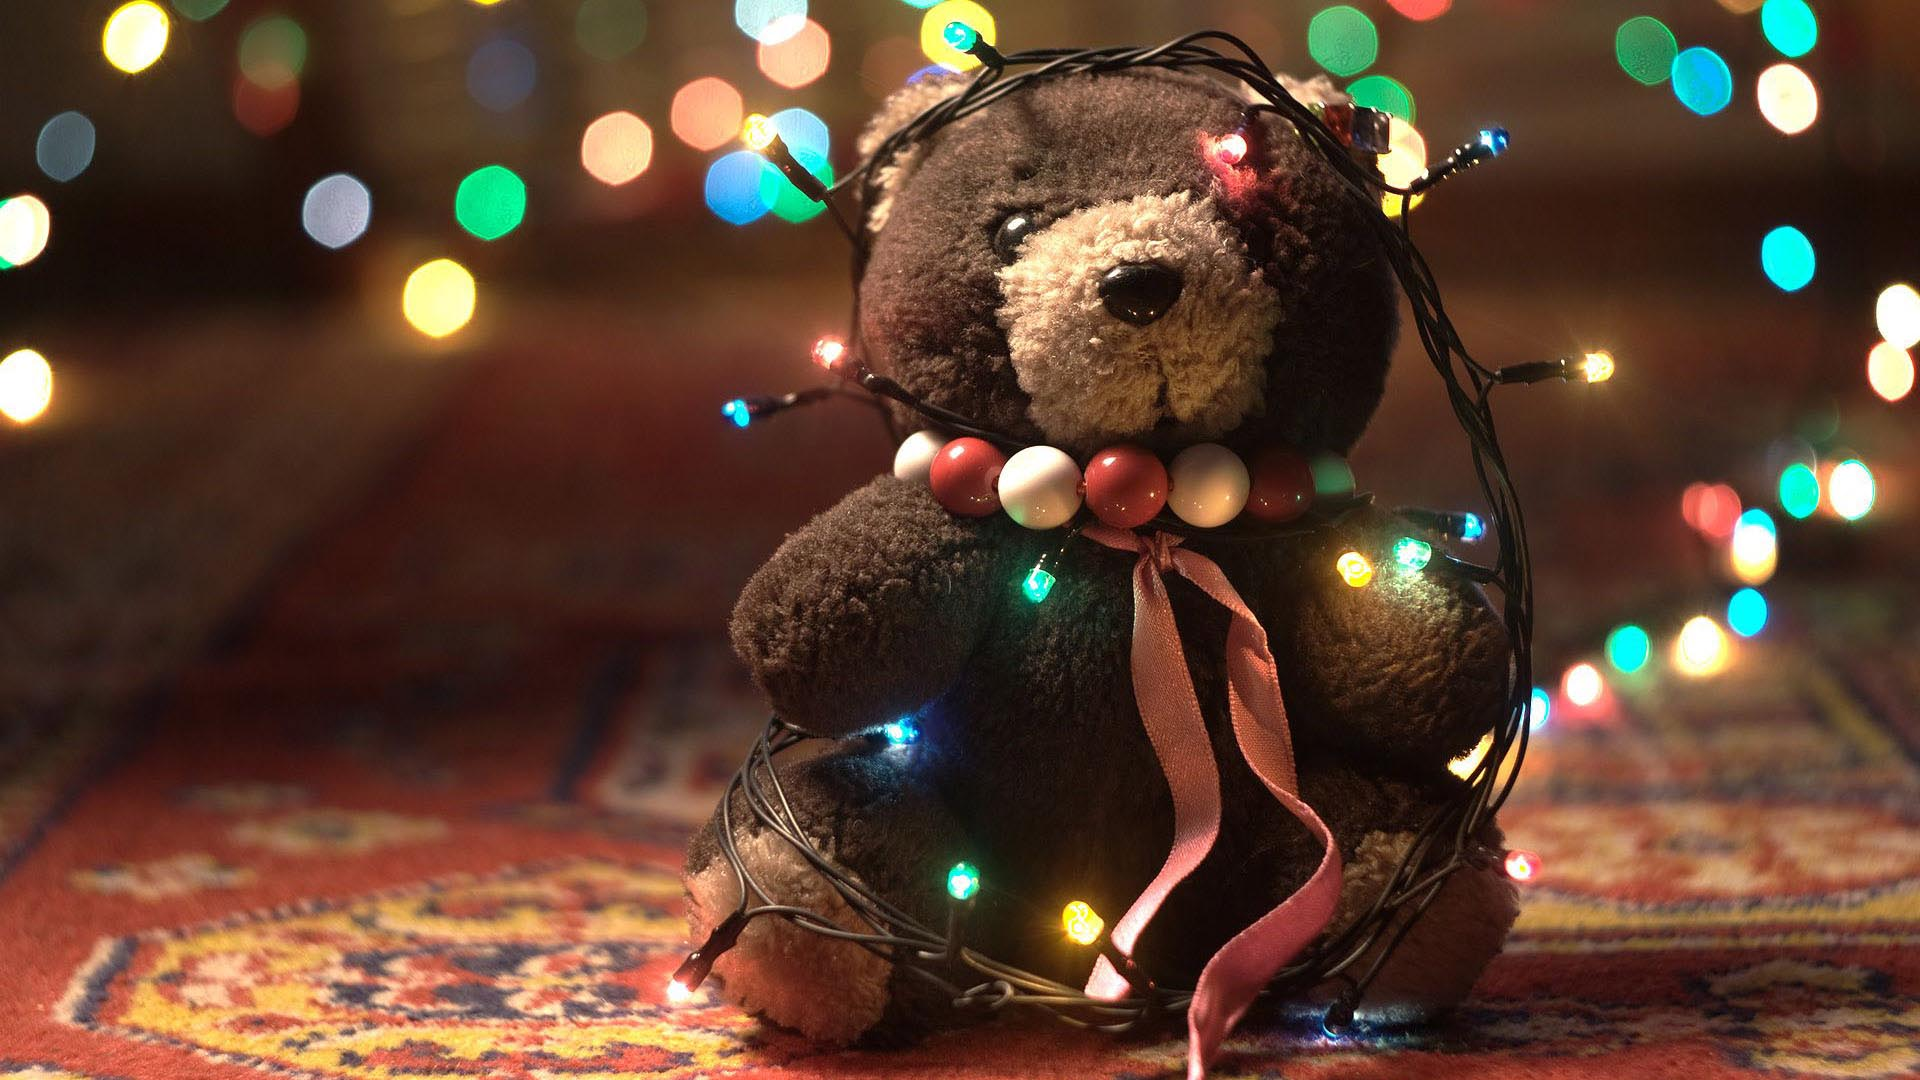 1000+ ideas about Christmas Lights Wallpaper on Pinterest